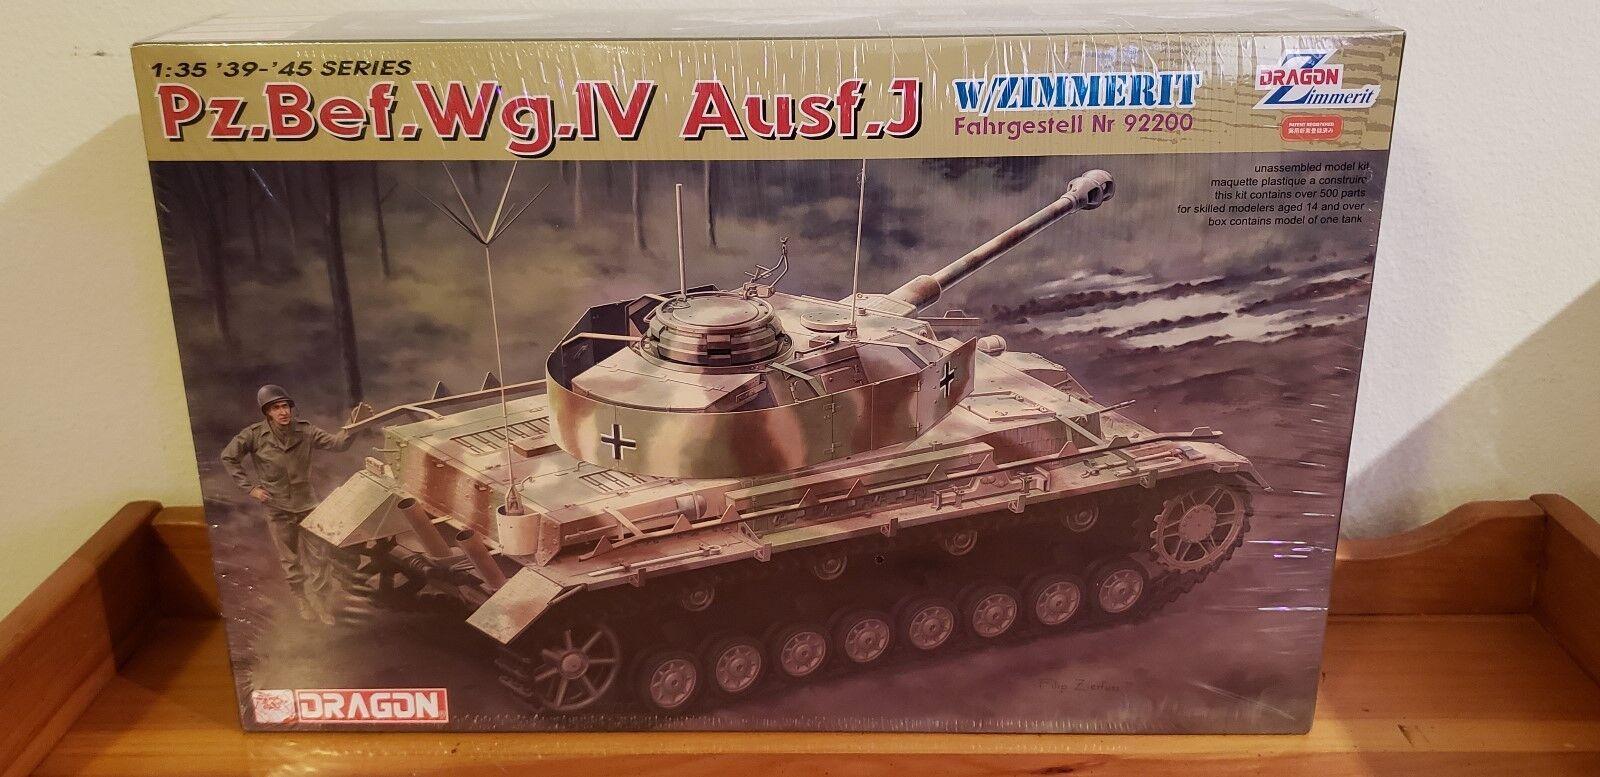 DRAGON 6823  1 35  Pz.Bef.Wg.IV Ausf.J Zimmerit